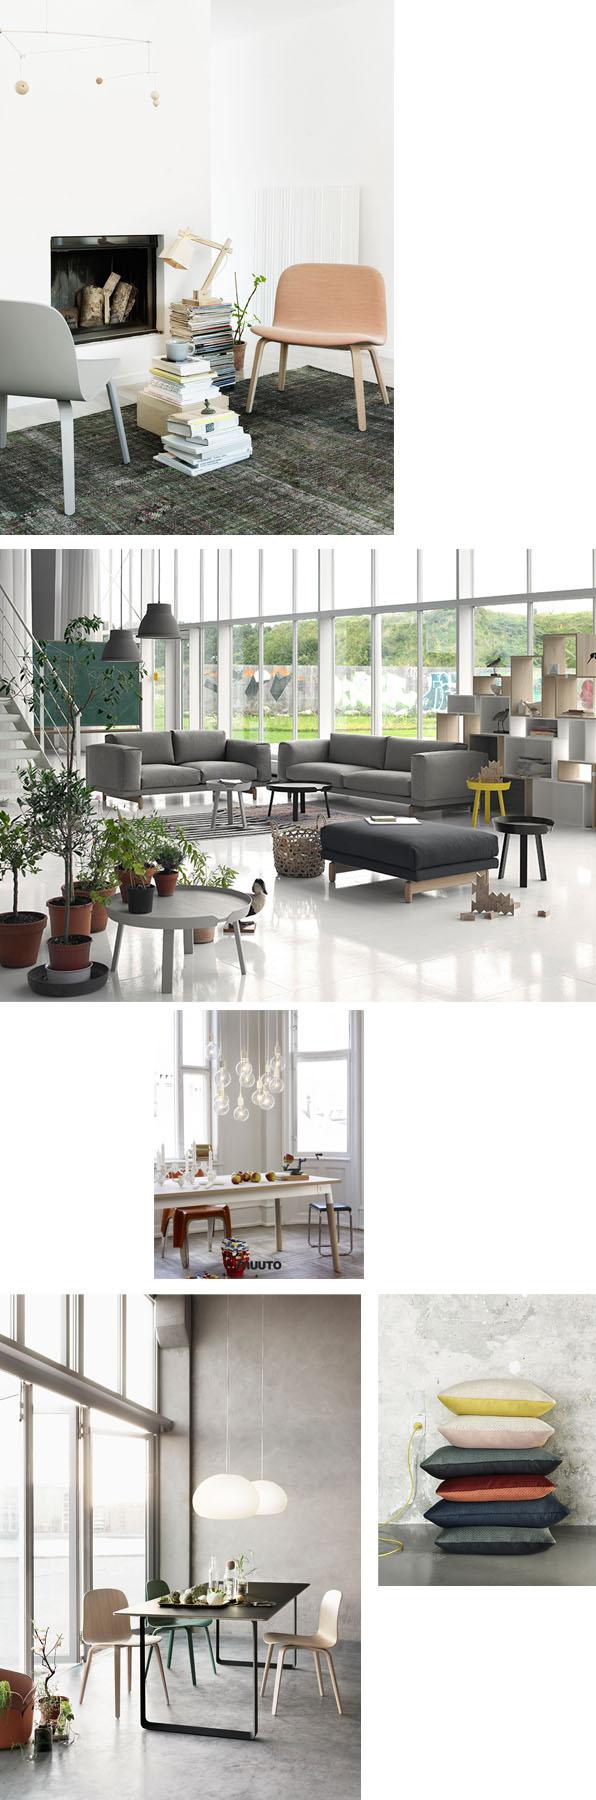 01 diseño nordico nordicdesign de © MUUTO en modus-vivendi